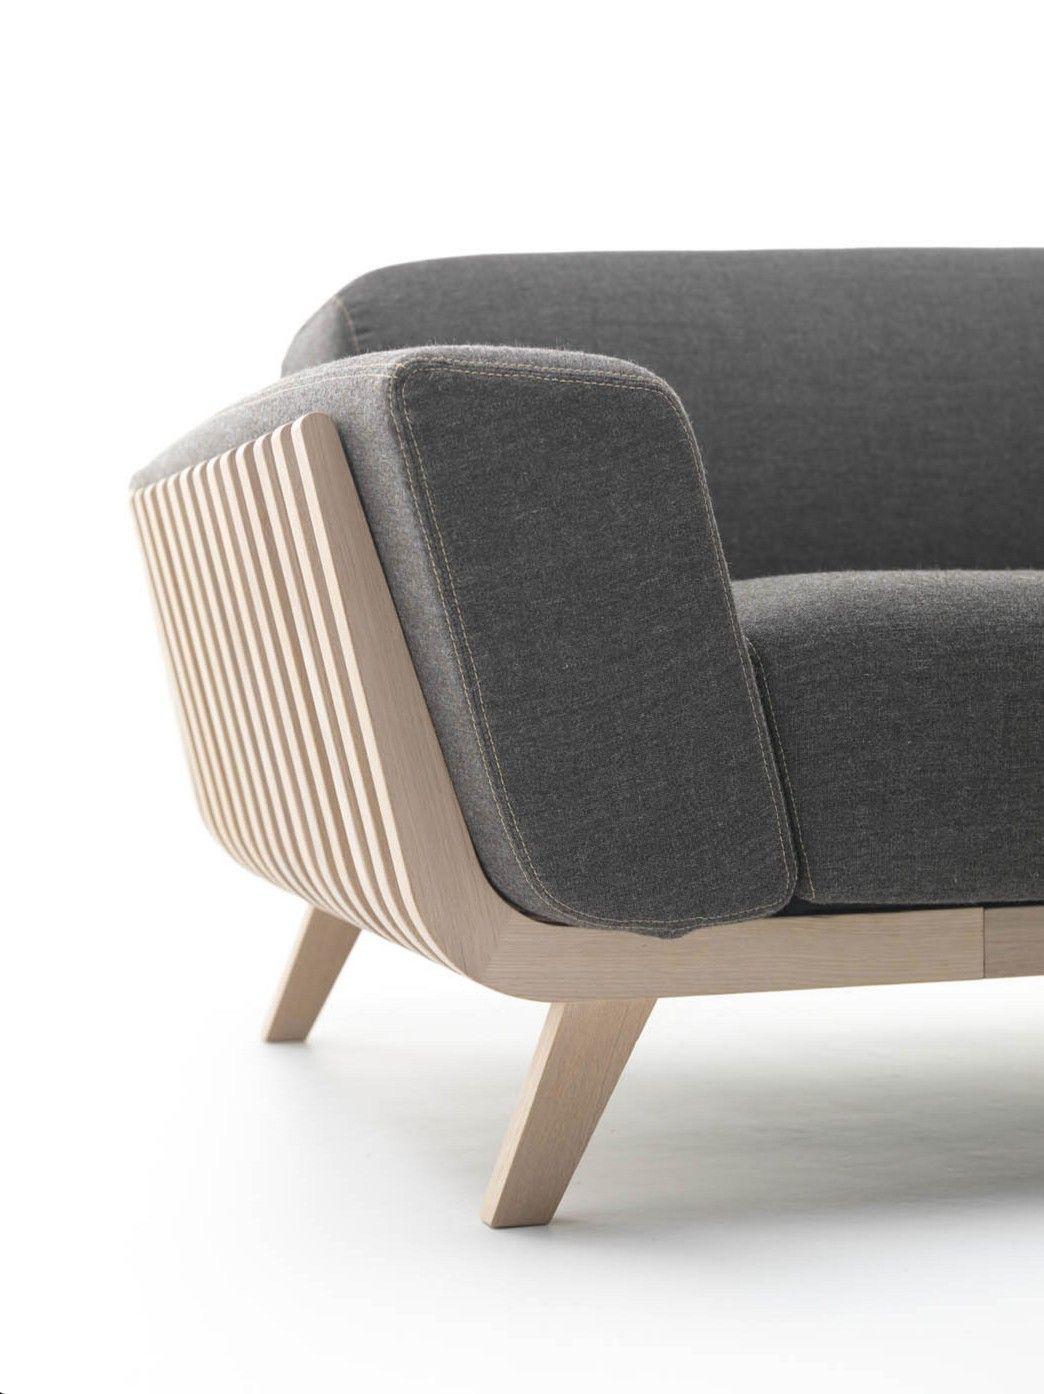 bdd img » canape bois design | mobilier | pinterest | mobilier